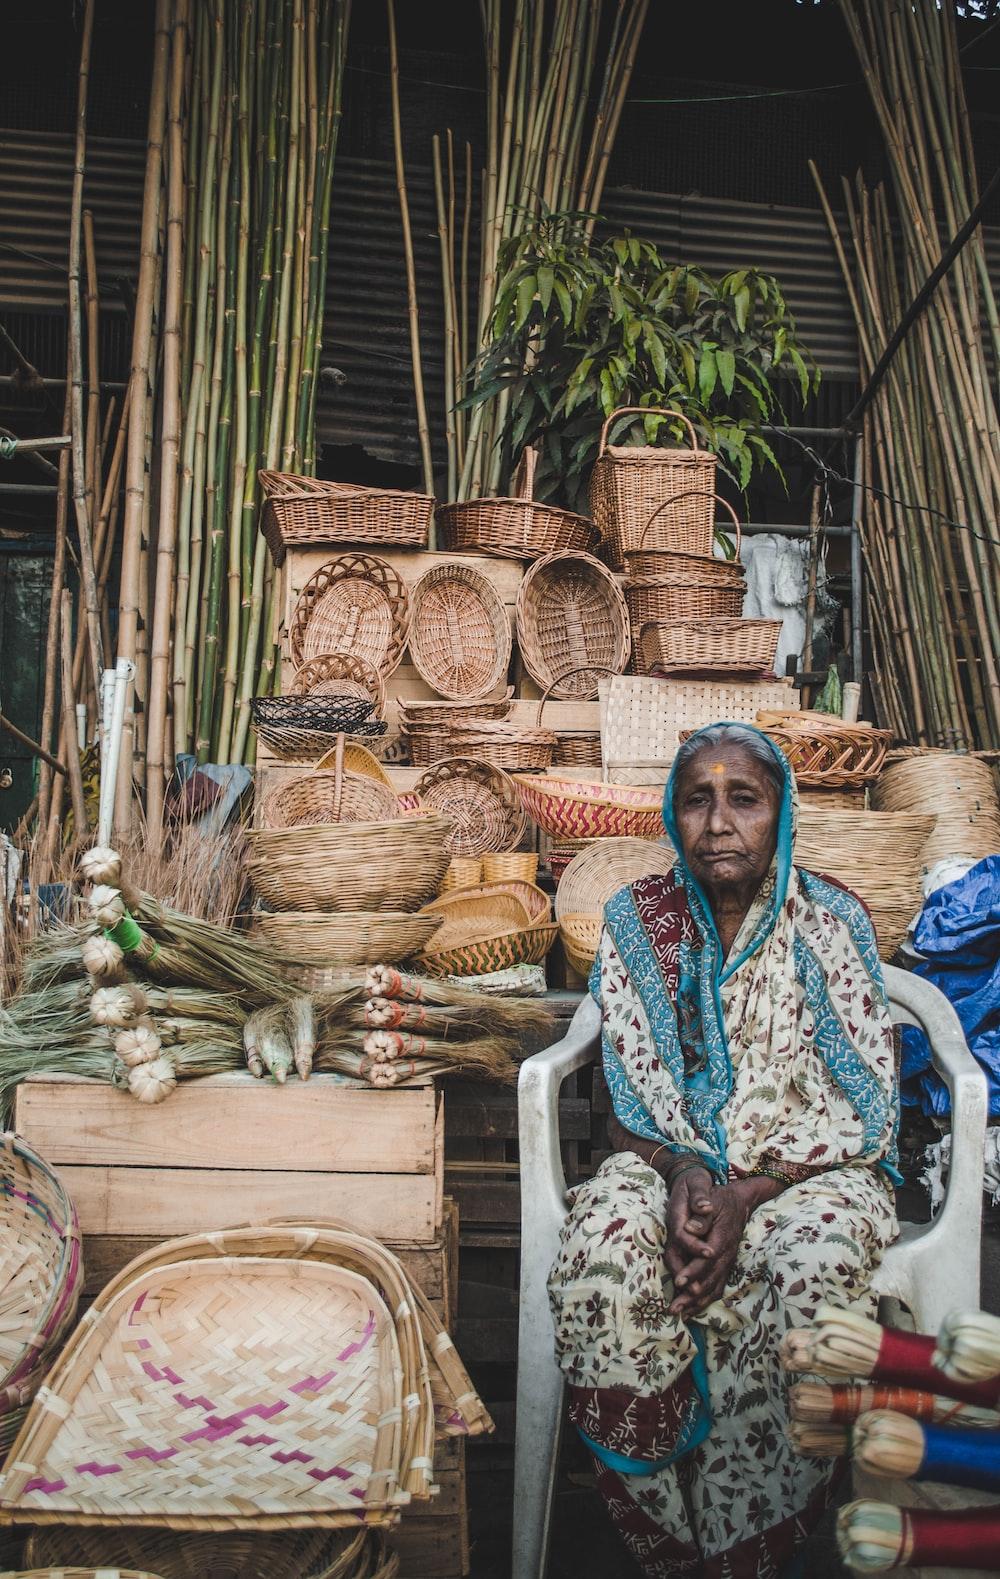 woman sitting on monobloc armchair